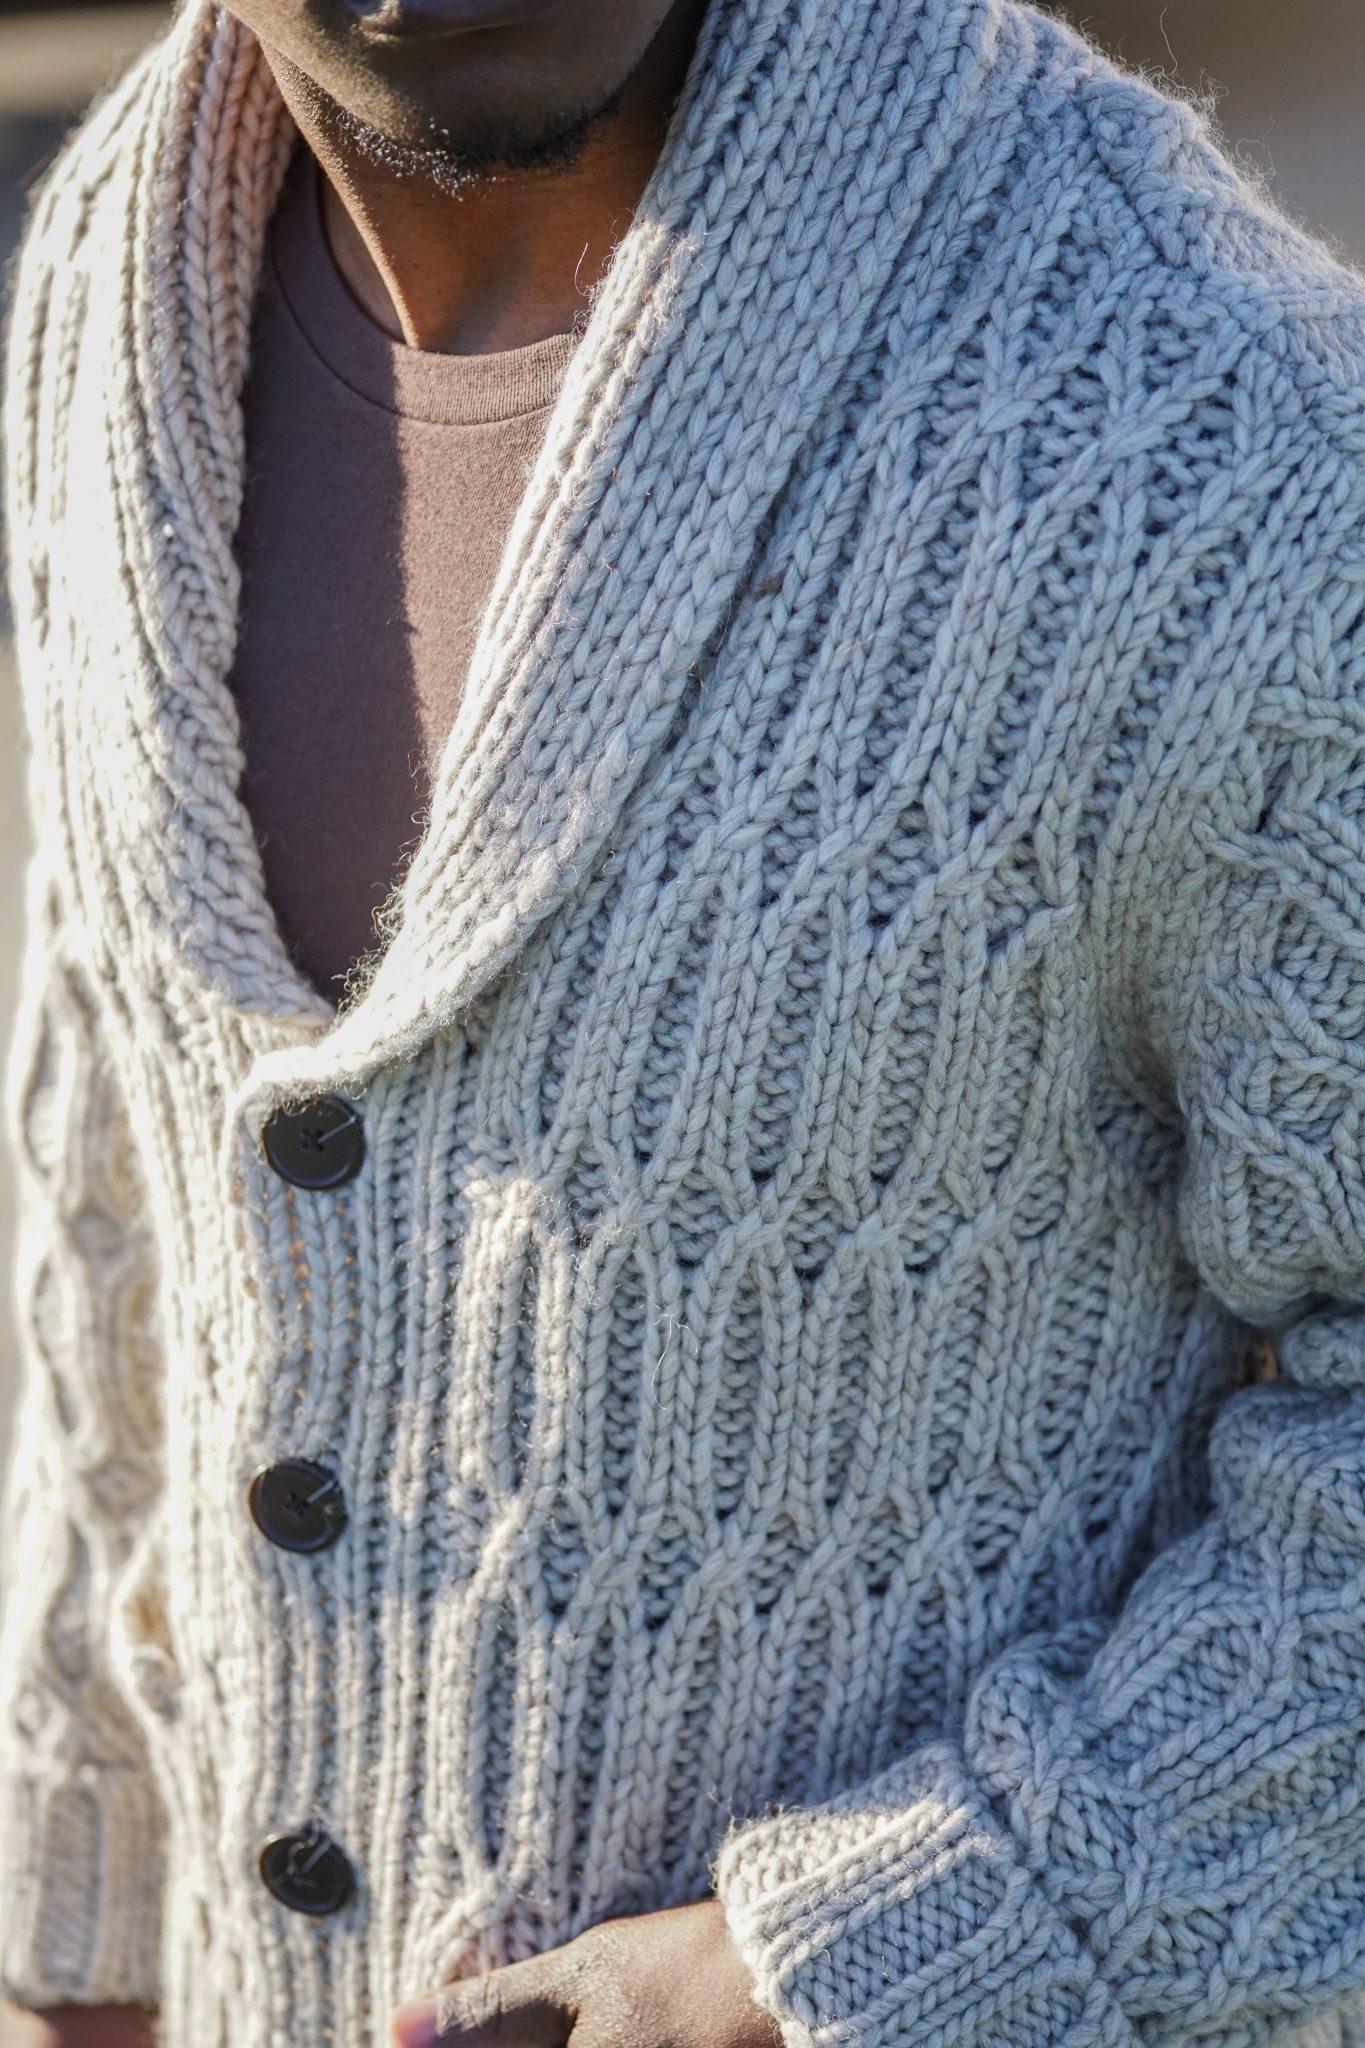 dapper-advisor-wearing-chunky-knit-sweater-cardigan-jack-threads-black-man